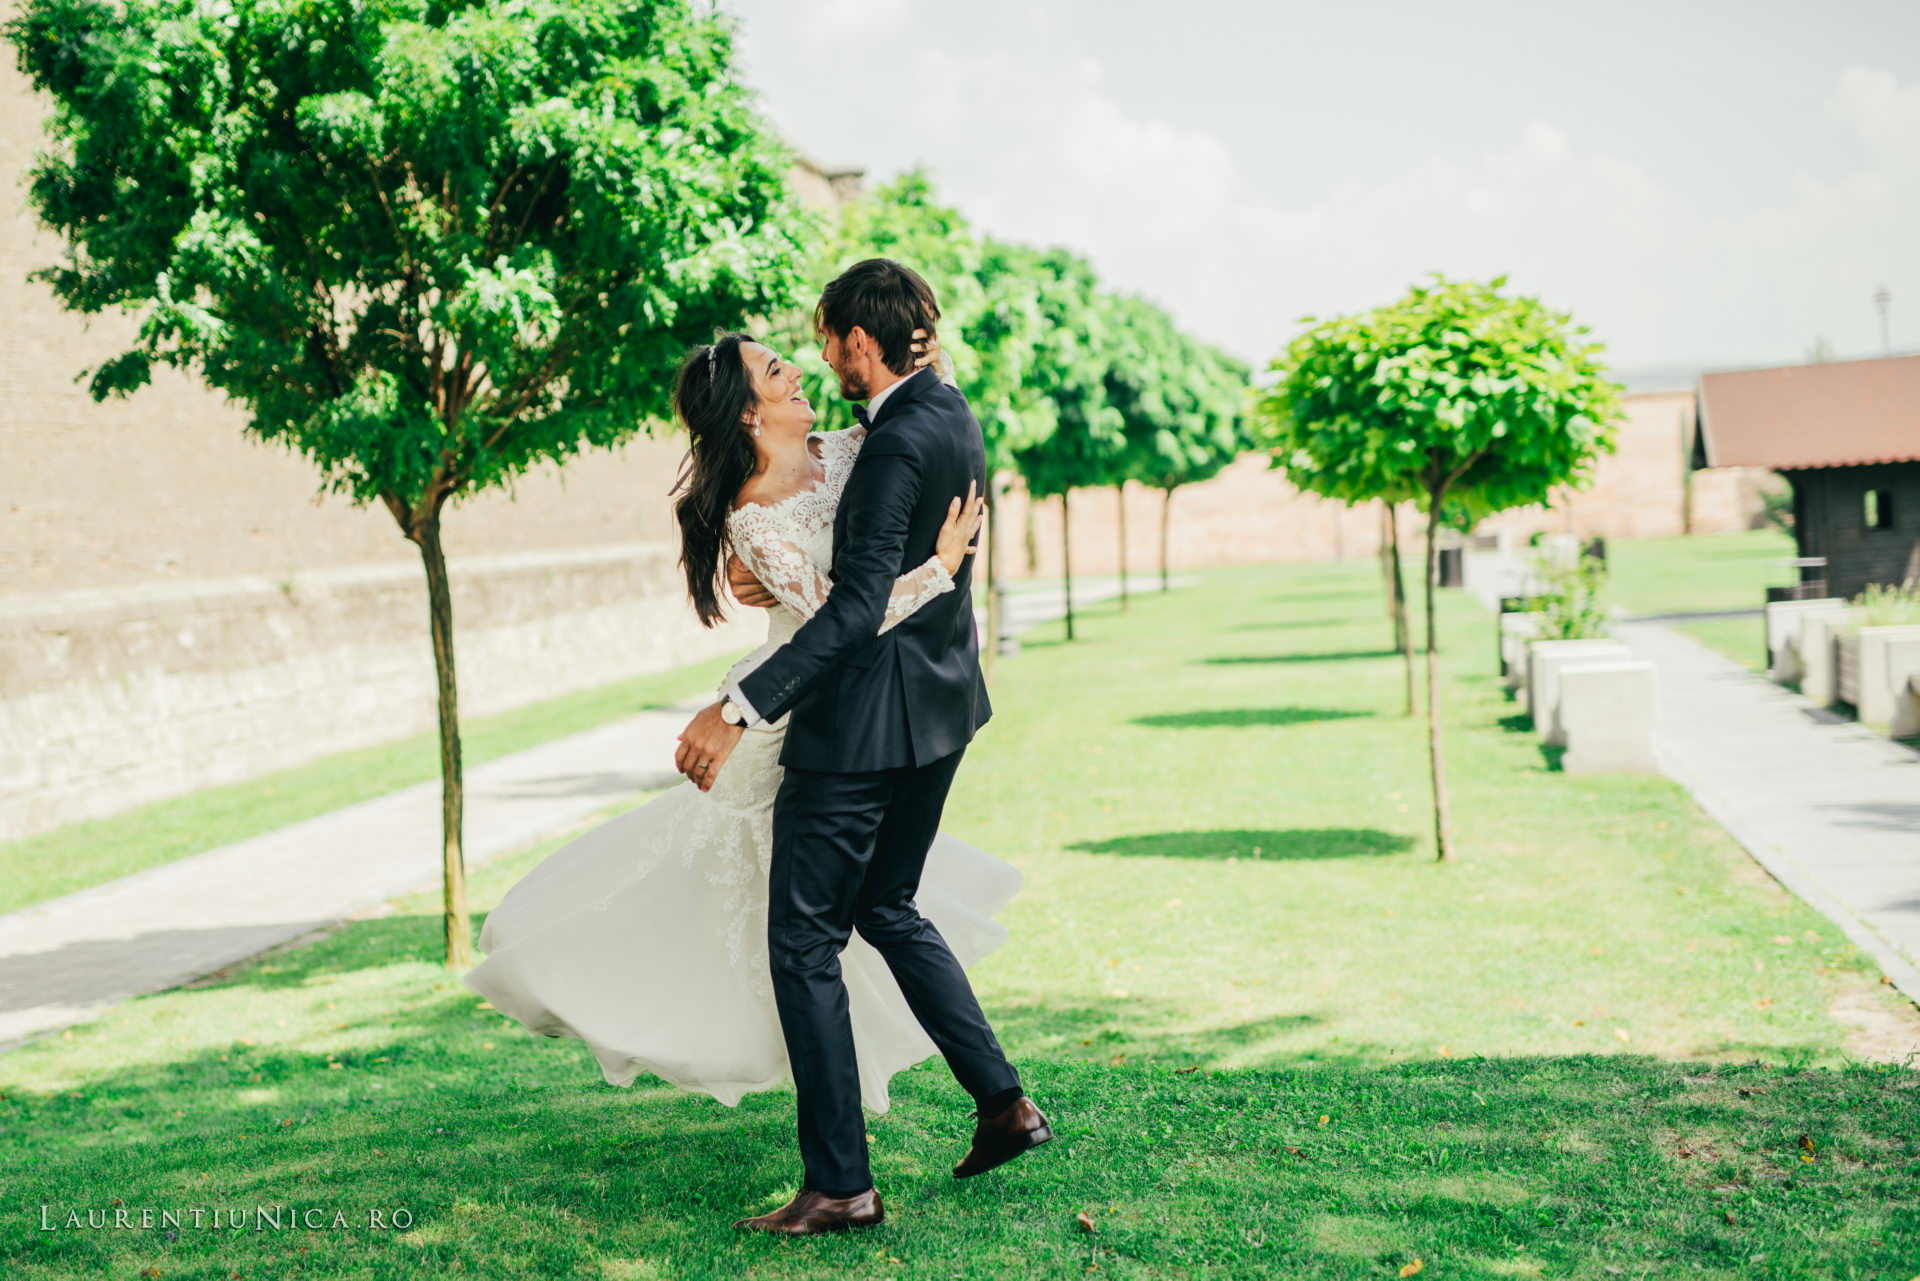 cristina_si_ovidiu-after-wedding-alba-iulia_fotograf_laurentiu_nica_41